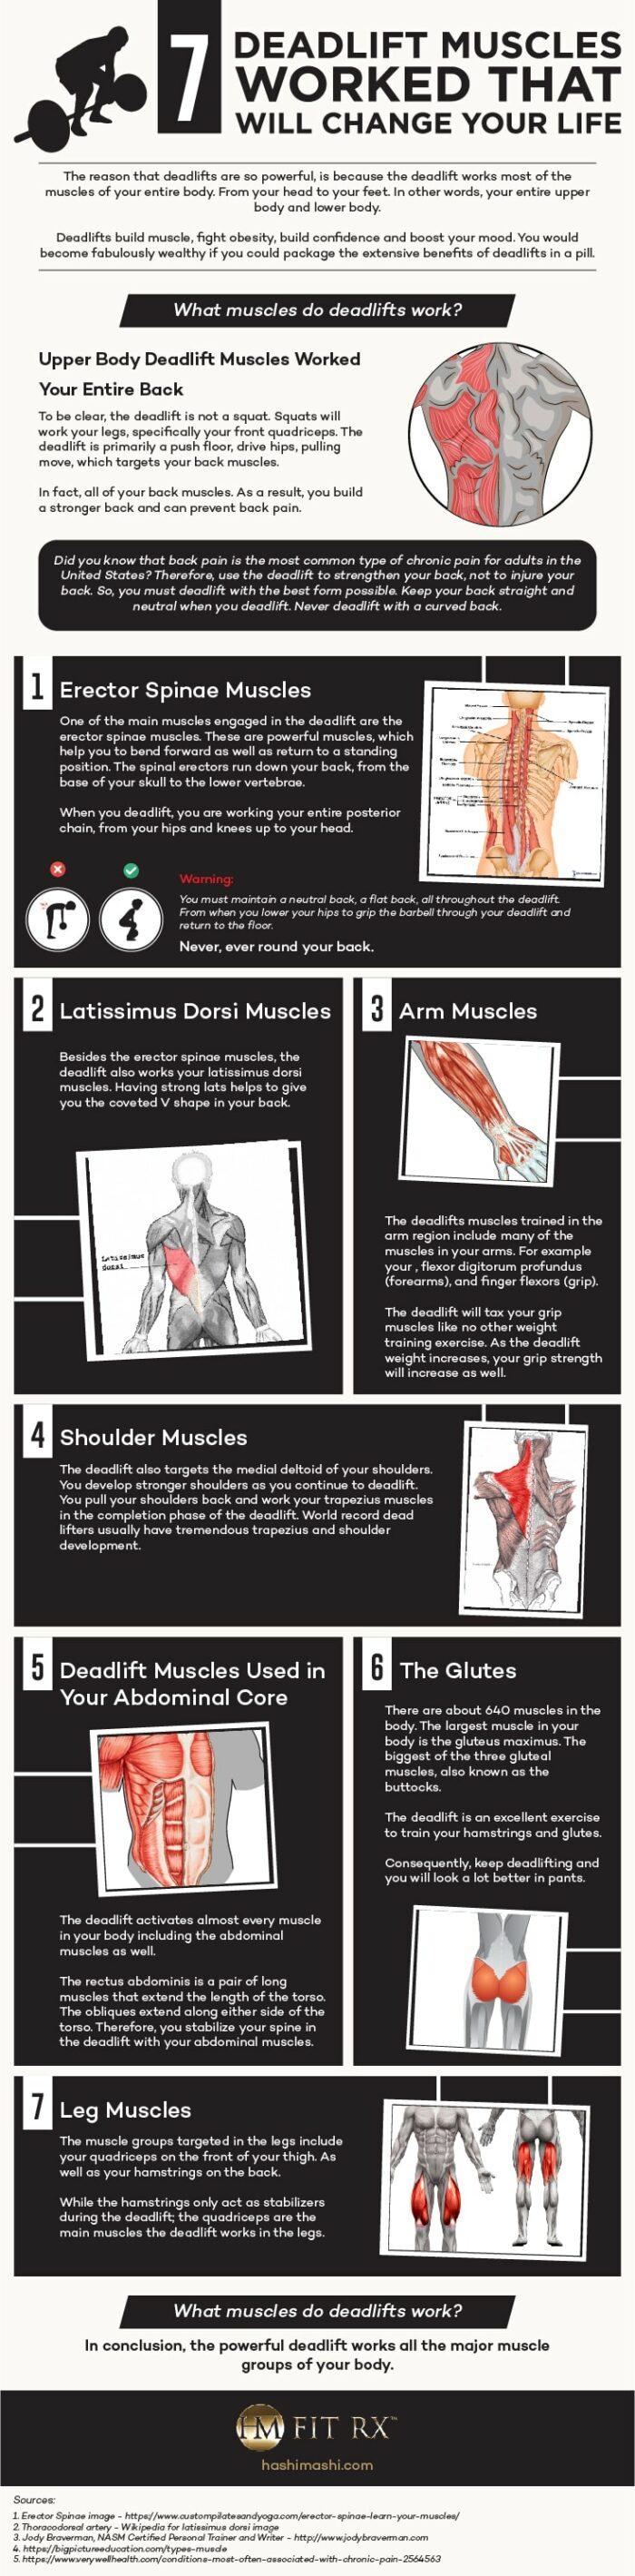 deadlift muscles used infographic credit HashiMashi.com